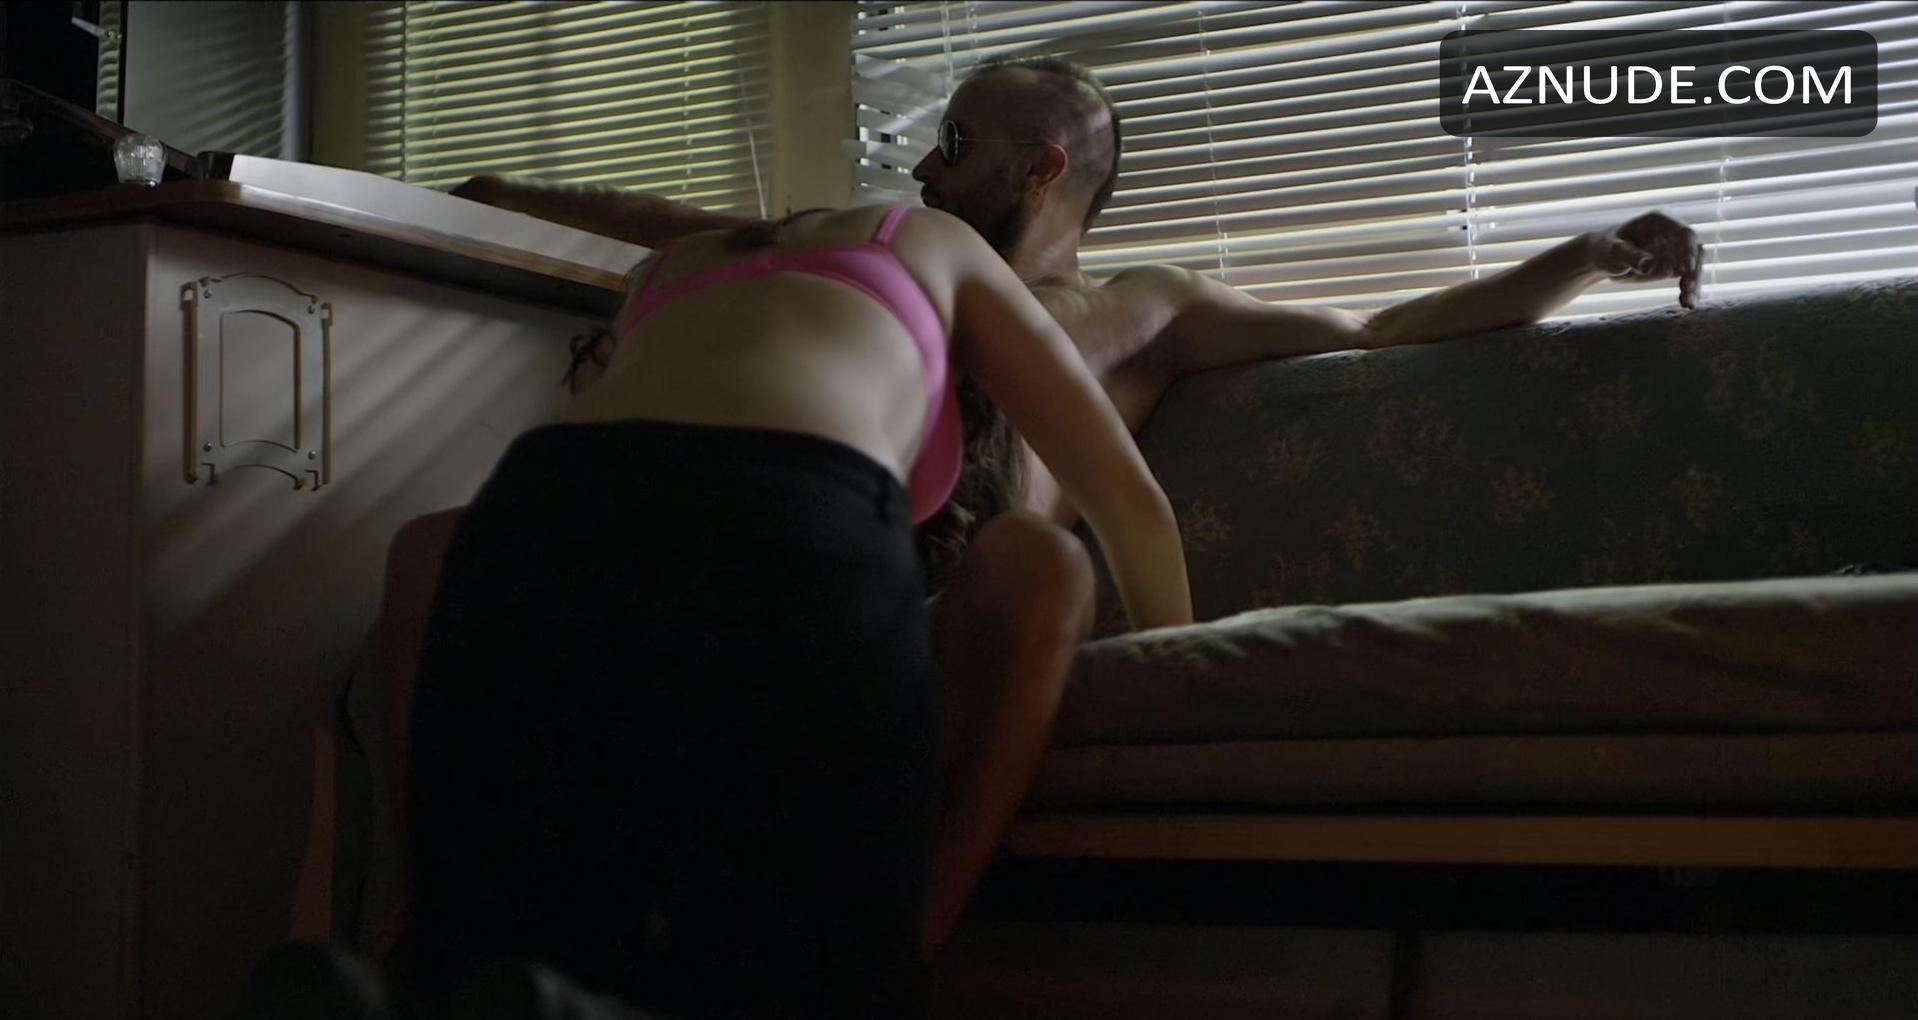 Ashley Harris Porn ashley vetere nude - aznude